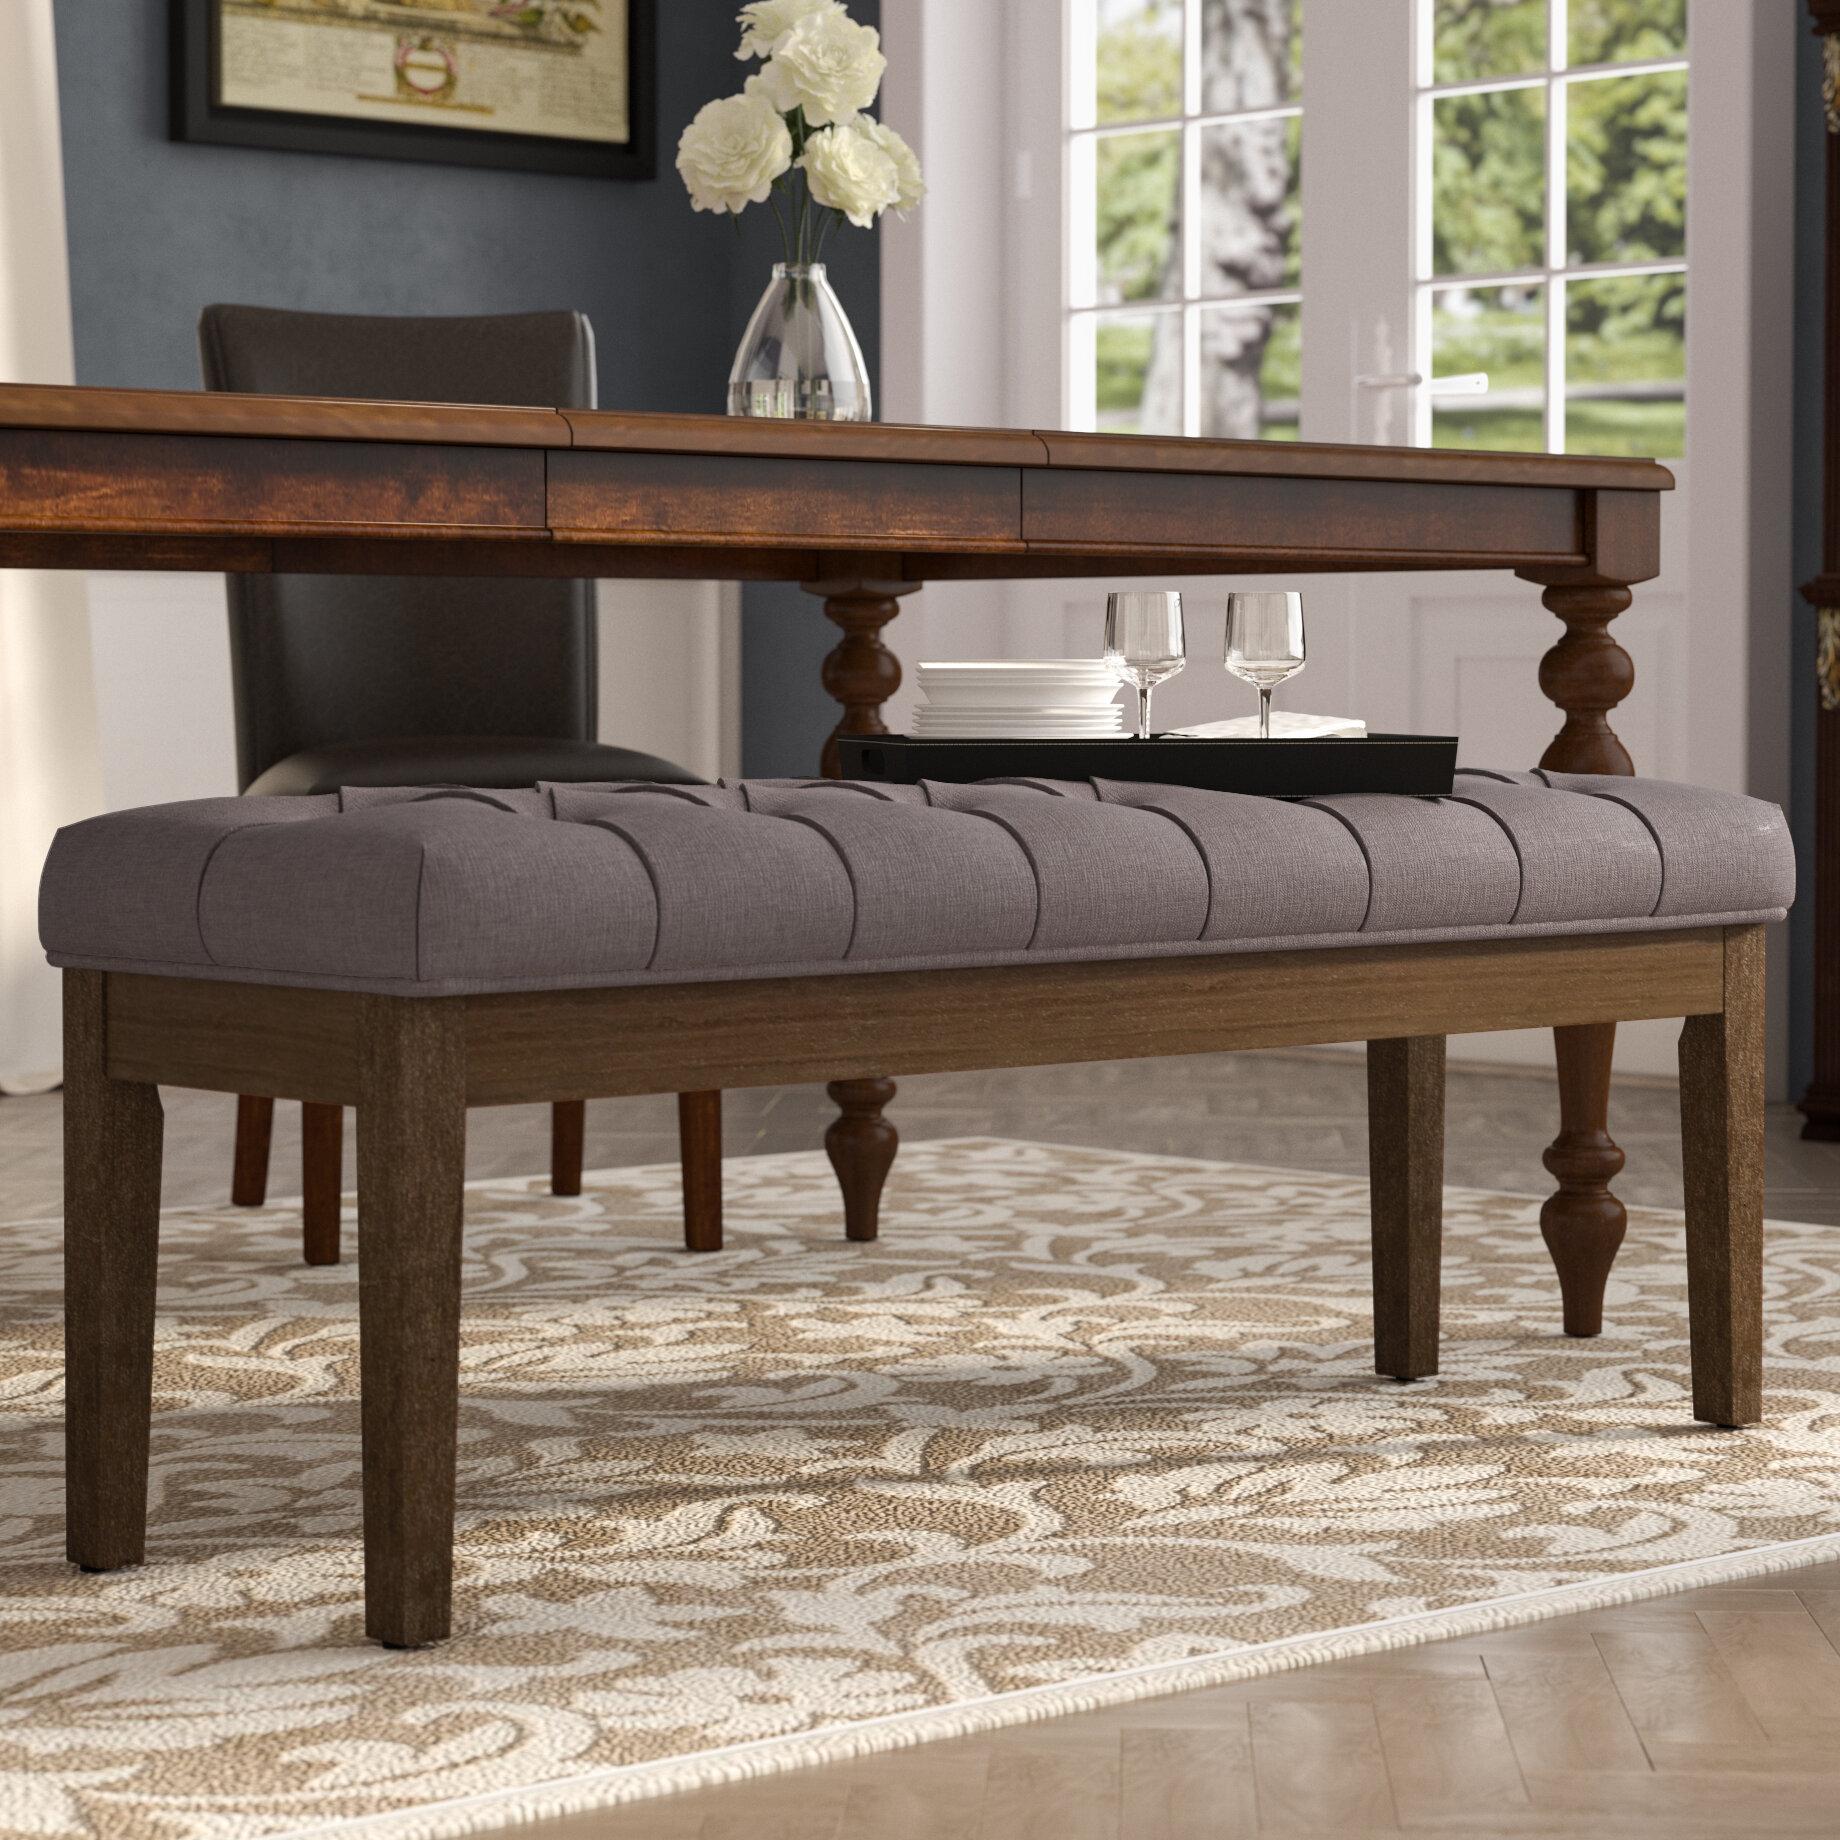 Pleasing Neumann Upholstered Bench Creativecarmelina Interior Chair Design Creativecarmelinacom